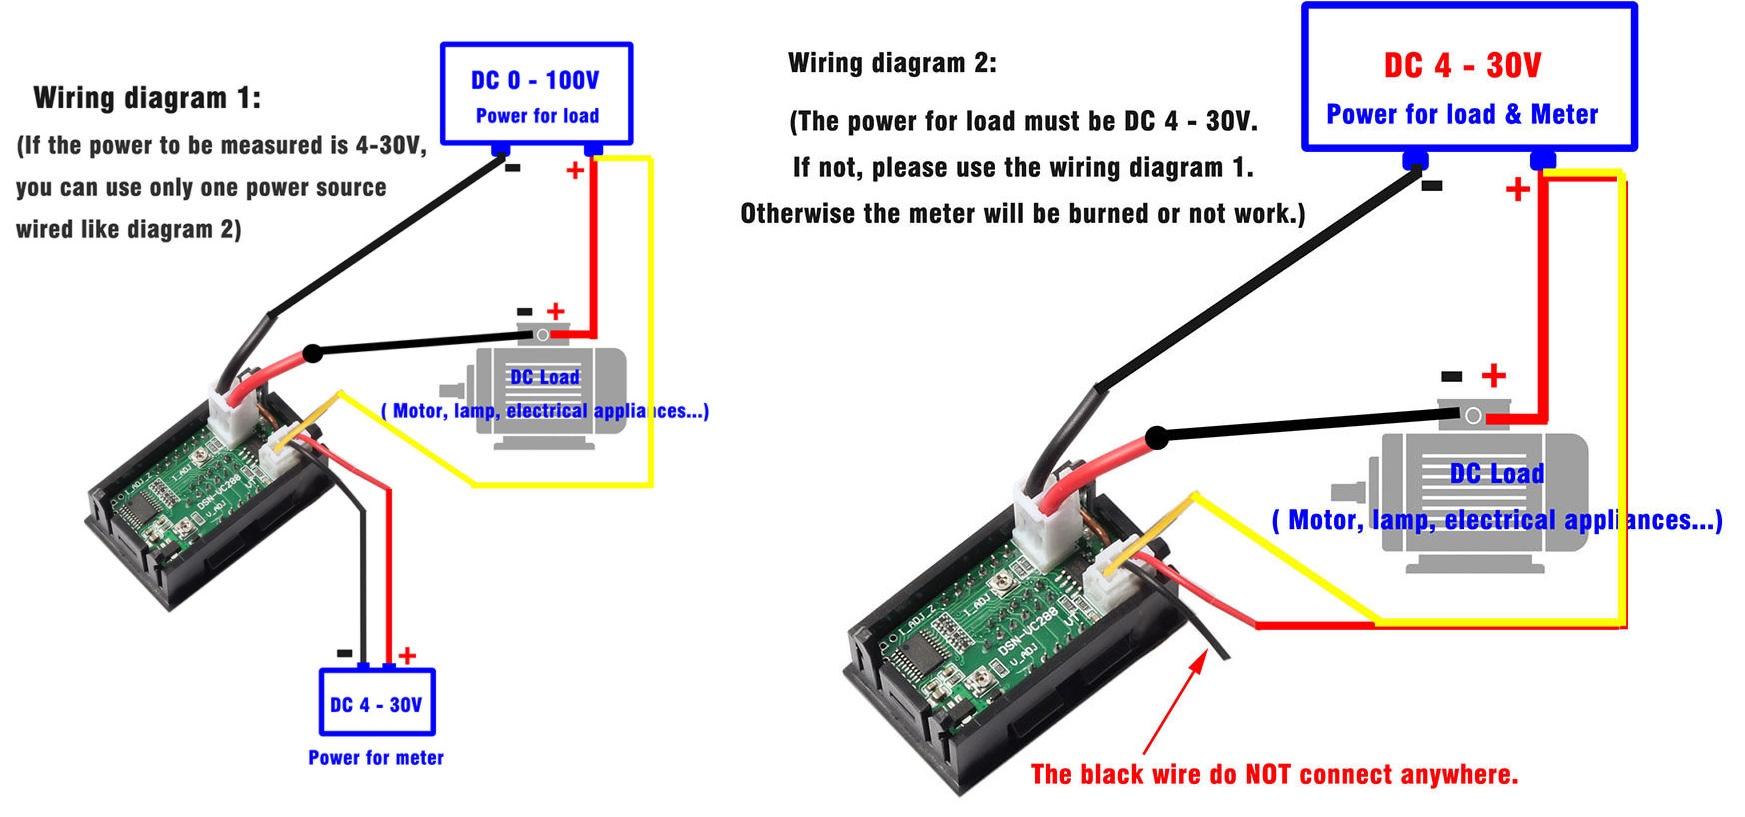 wiring diagram for amp volt meter with shunt ac amp meter